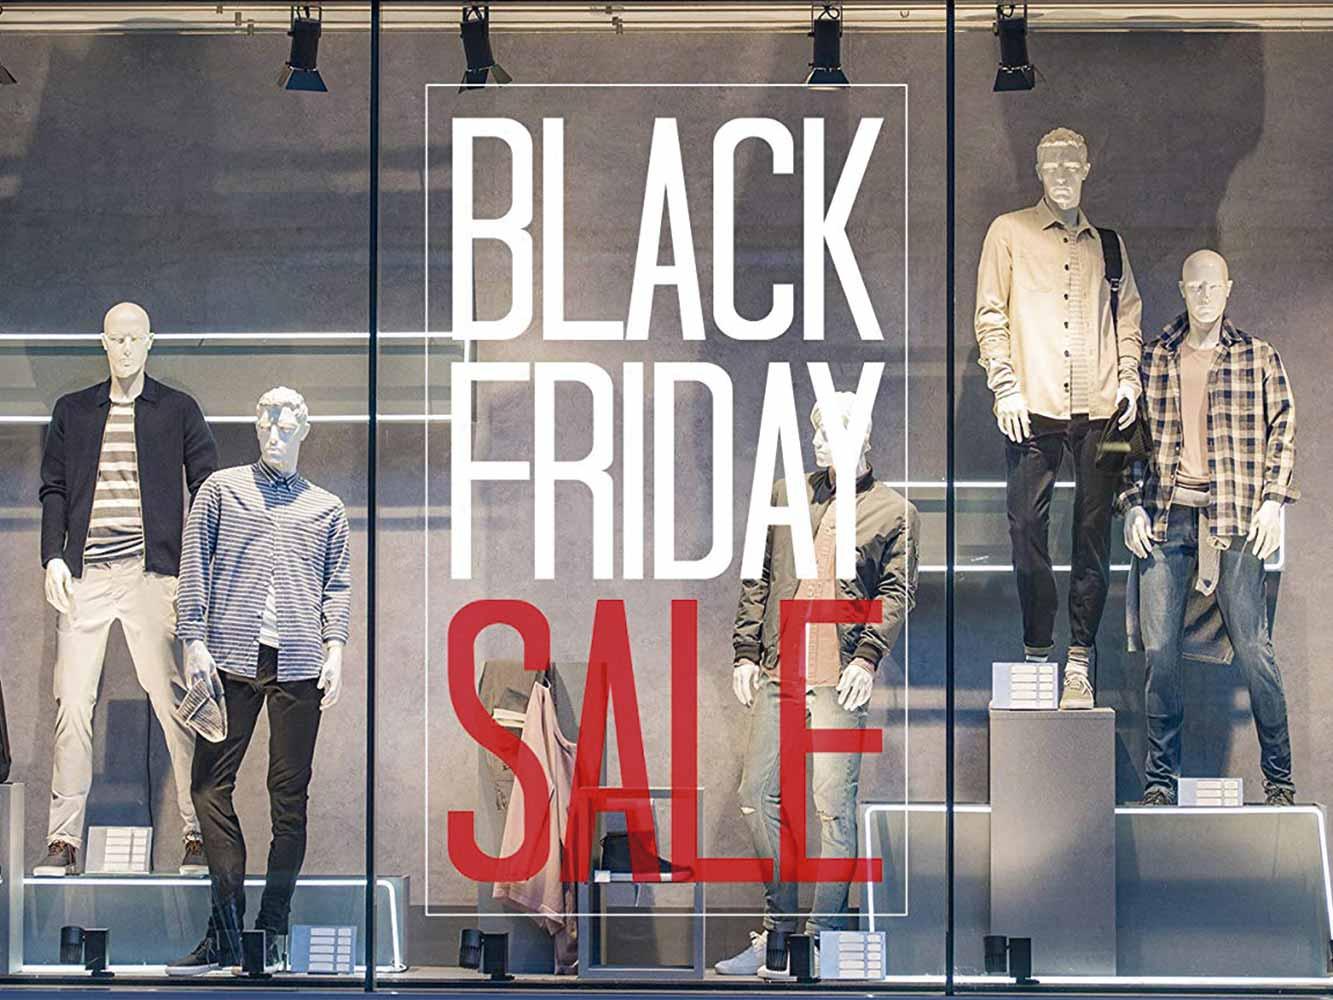 Vinilo Escaparate Black Friday Sale Blanco Rojo | Carteles XXL - Impresión carteleria publicitaria